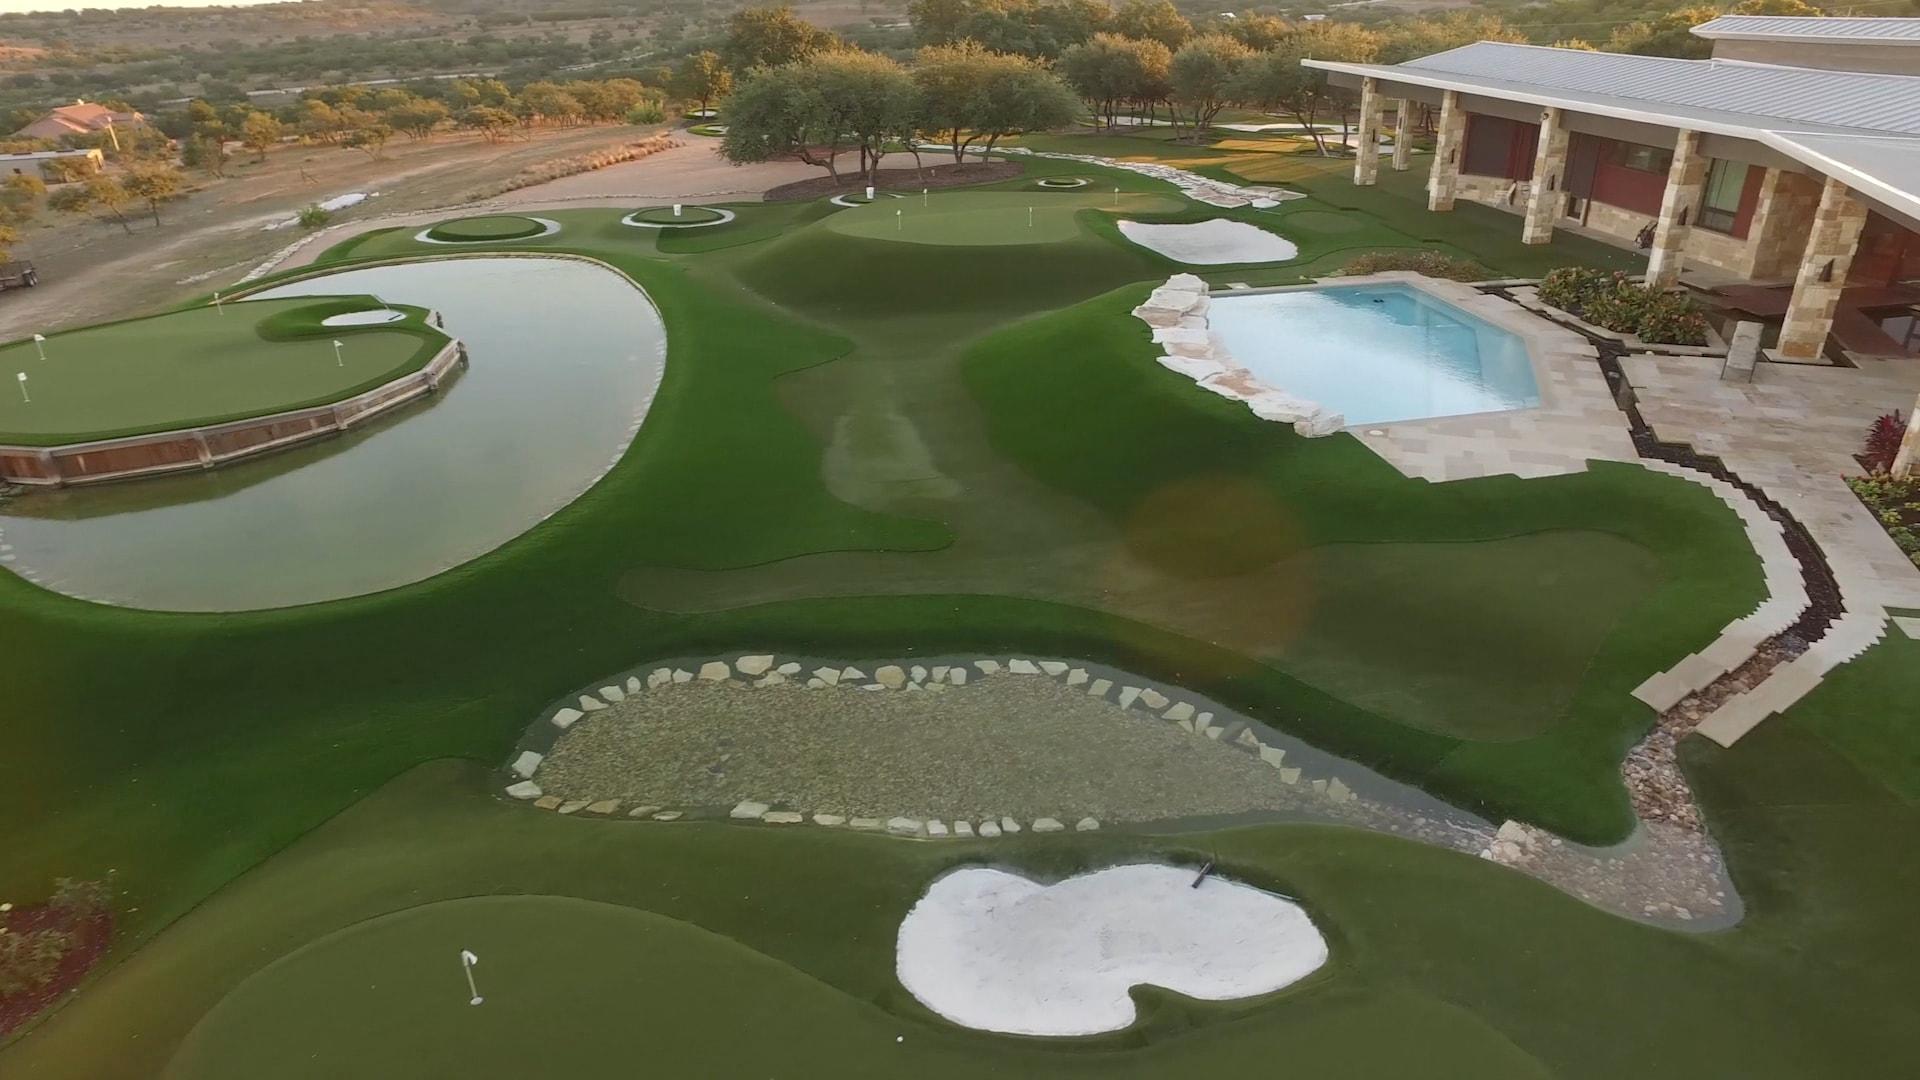 Wedge Week: Pelzu0027s Backyard Golf OasisOct 09, 2017